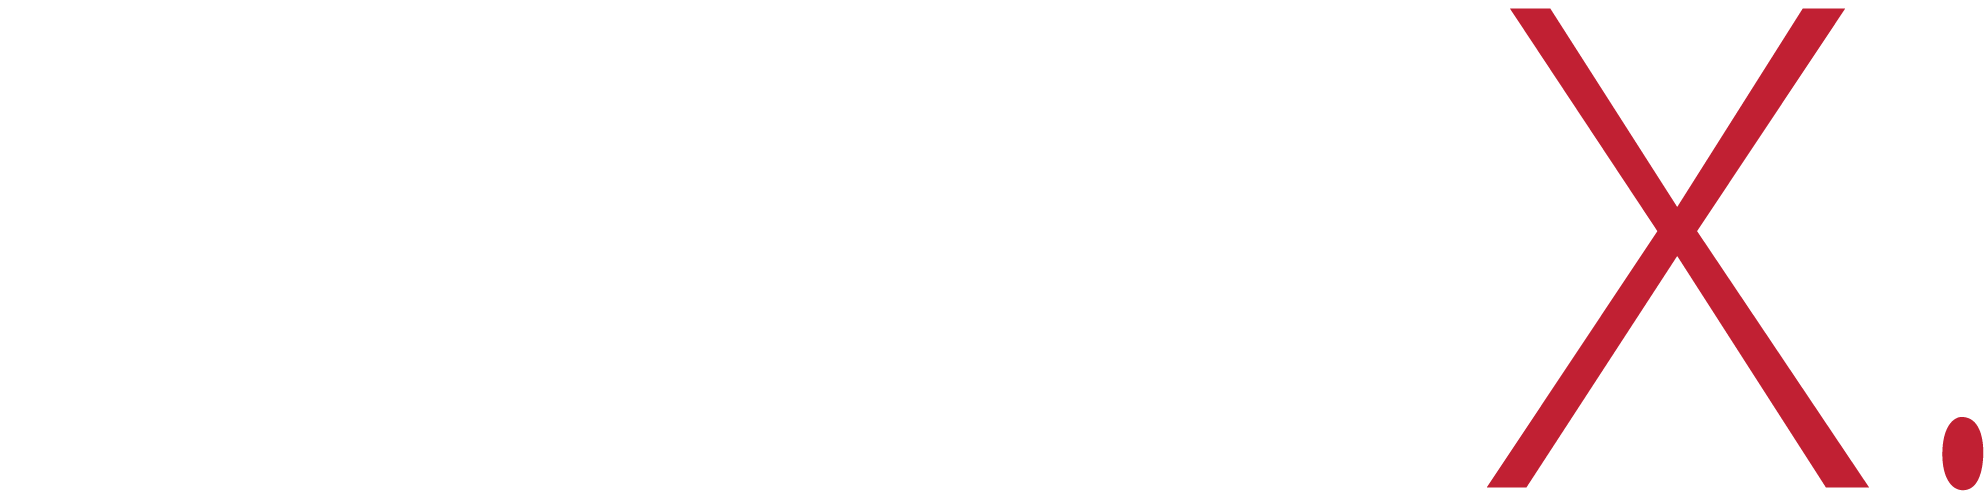 STACX - LOGO